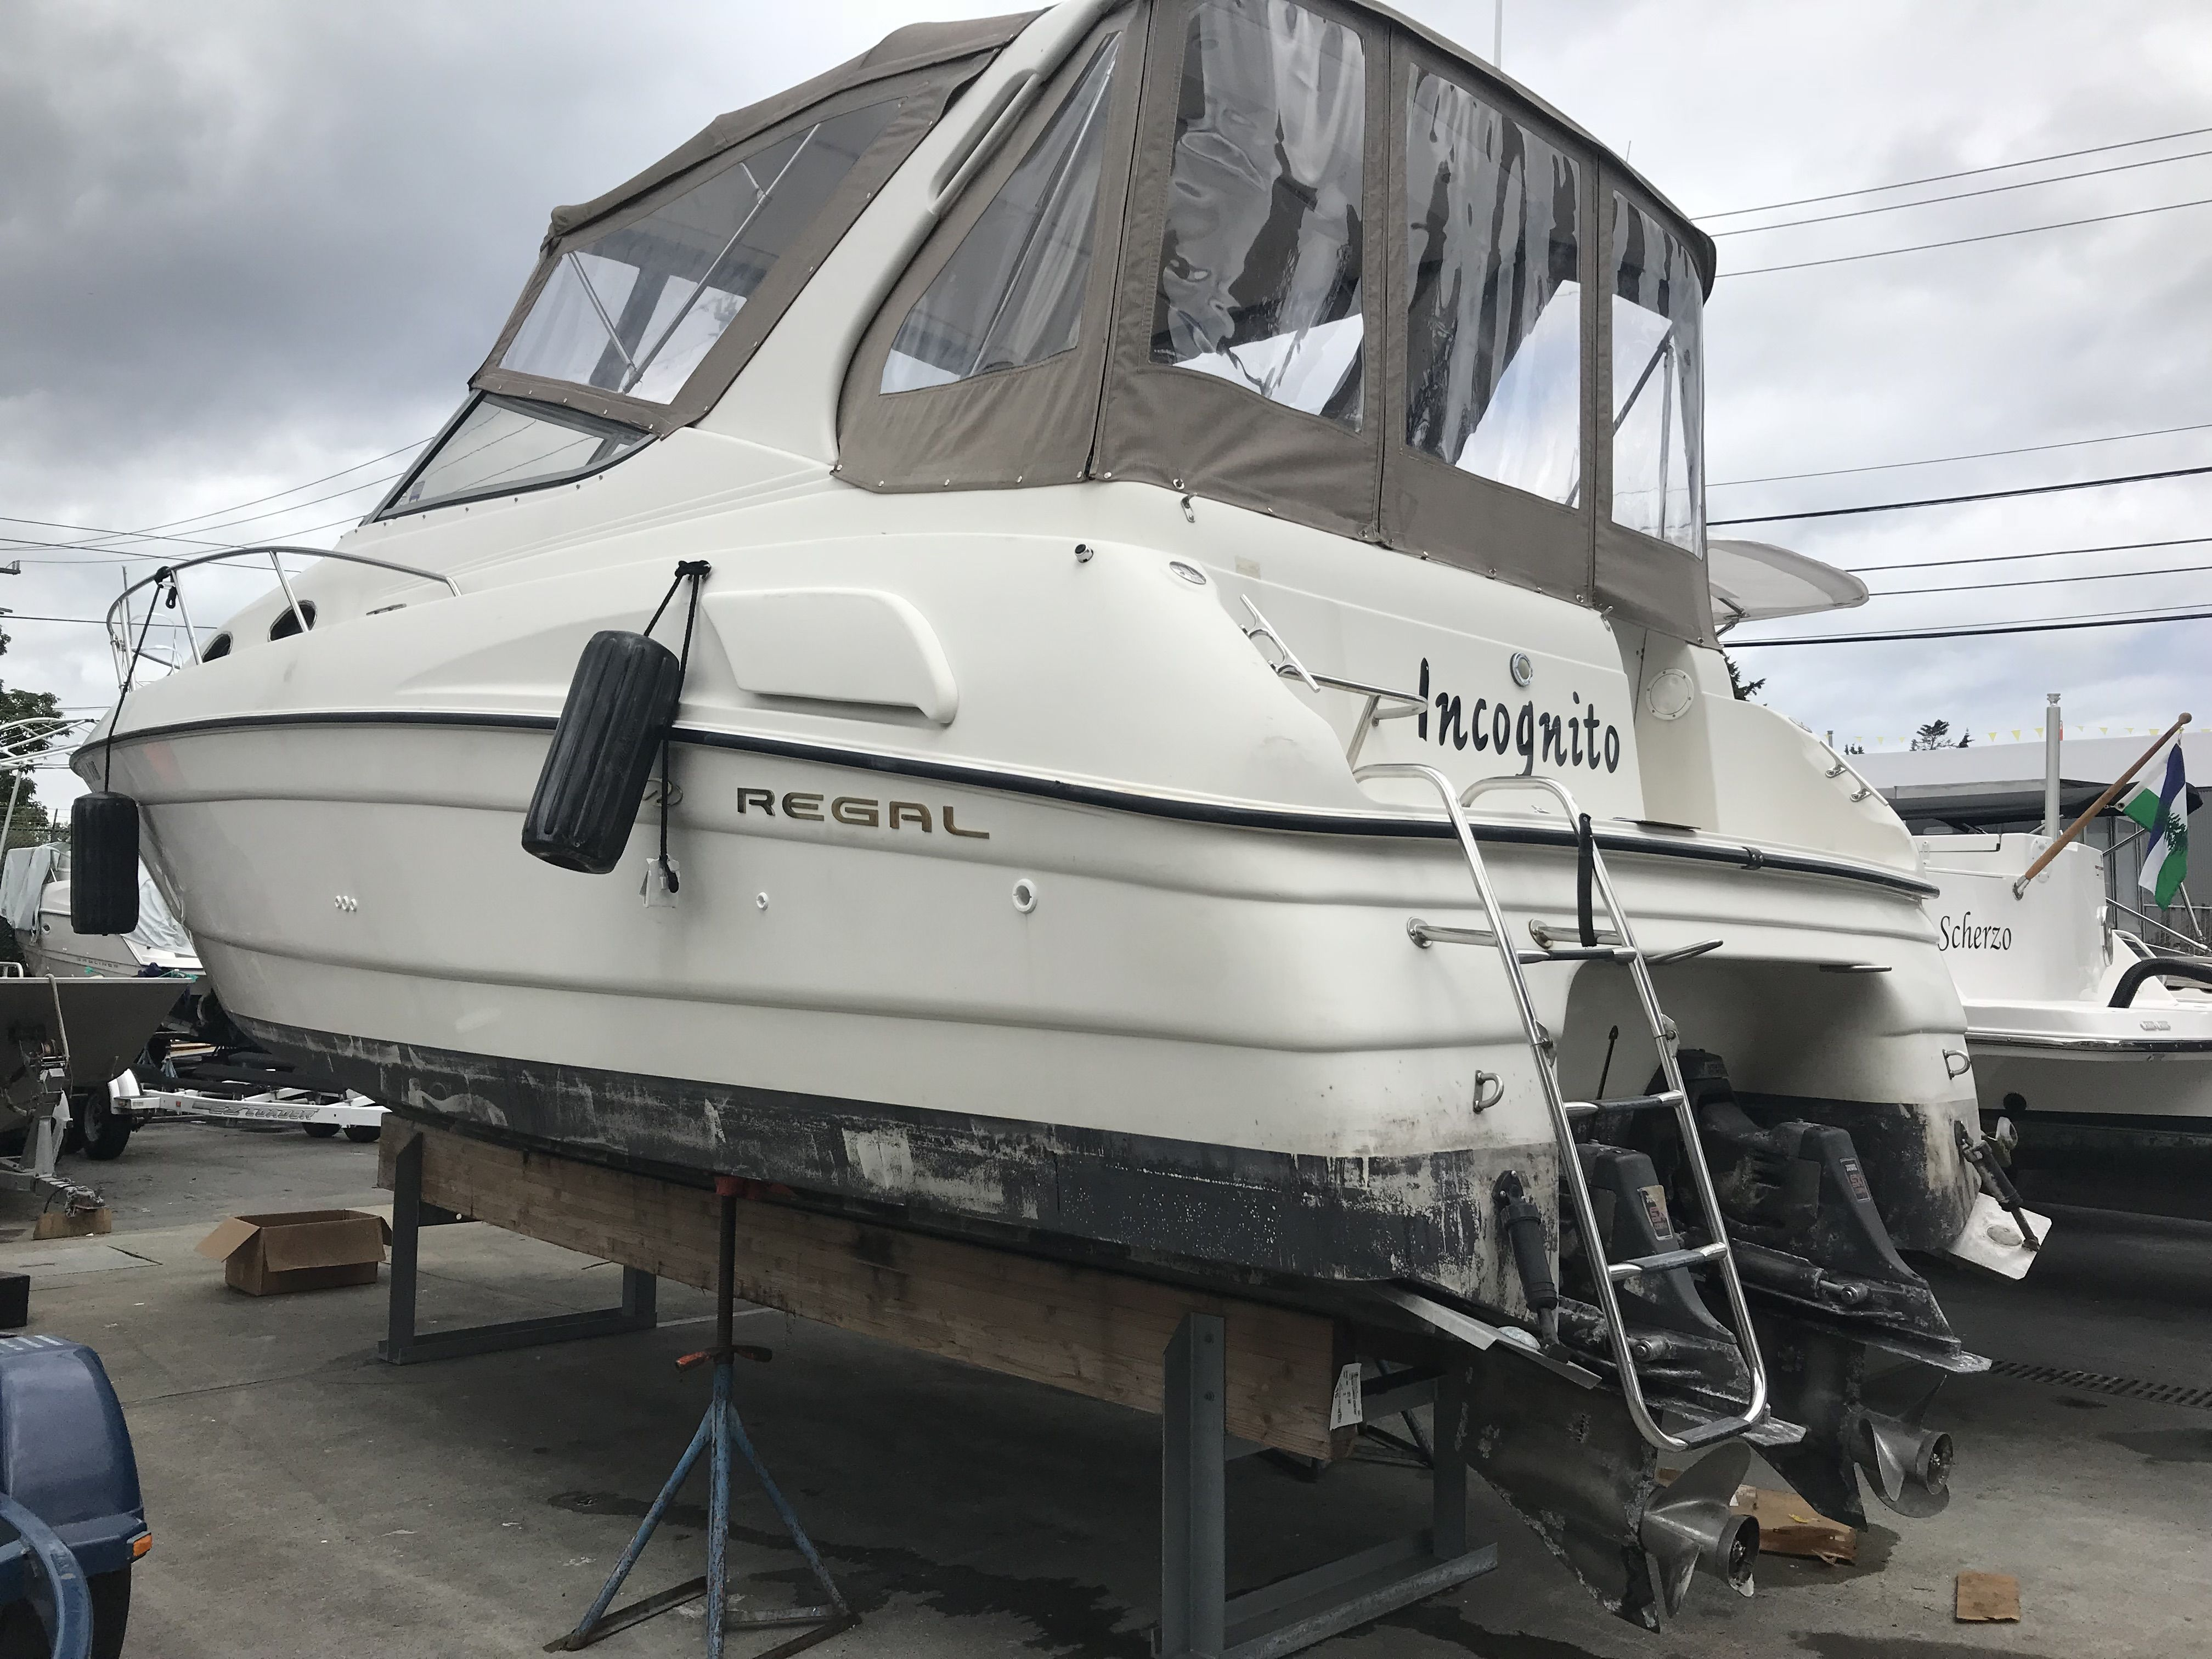 Craigslist Seattle Washington Boats For Sale - DECRAIGS